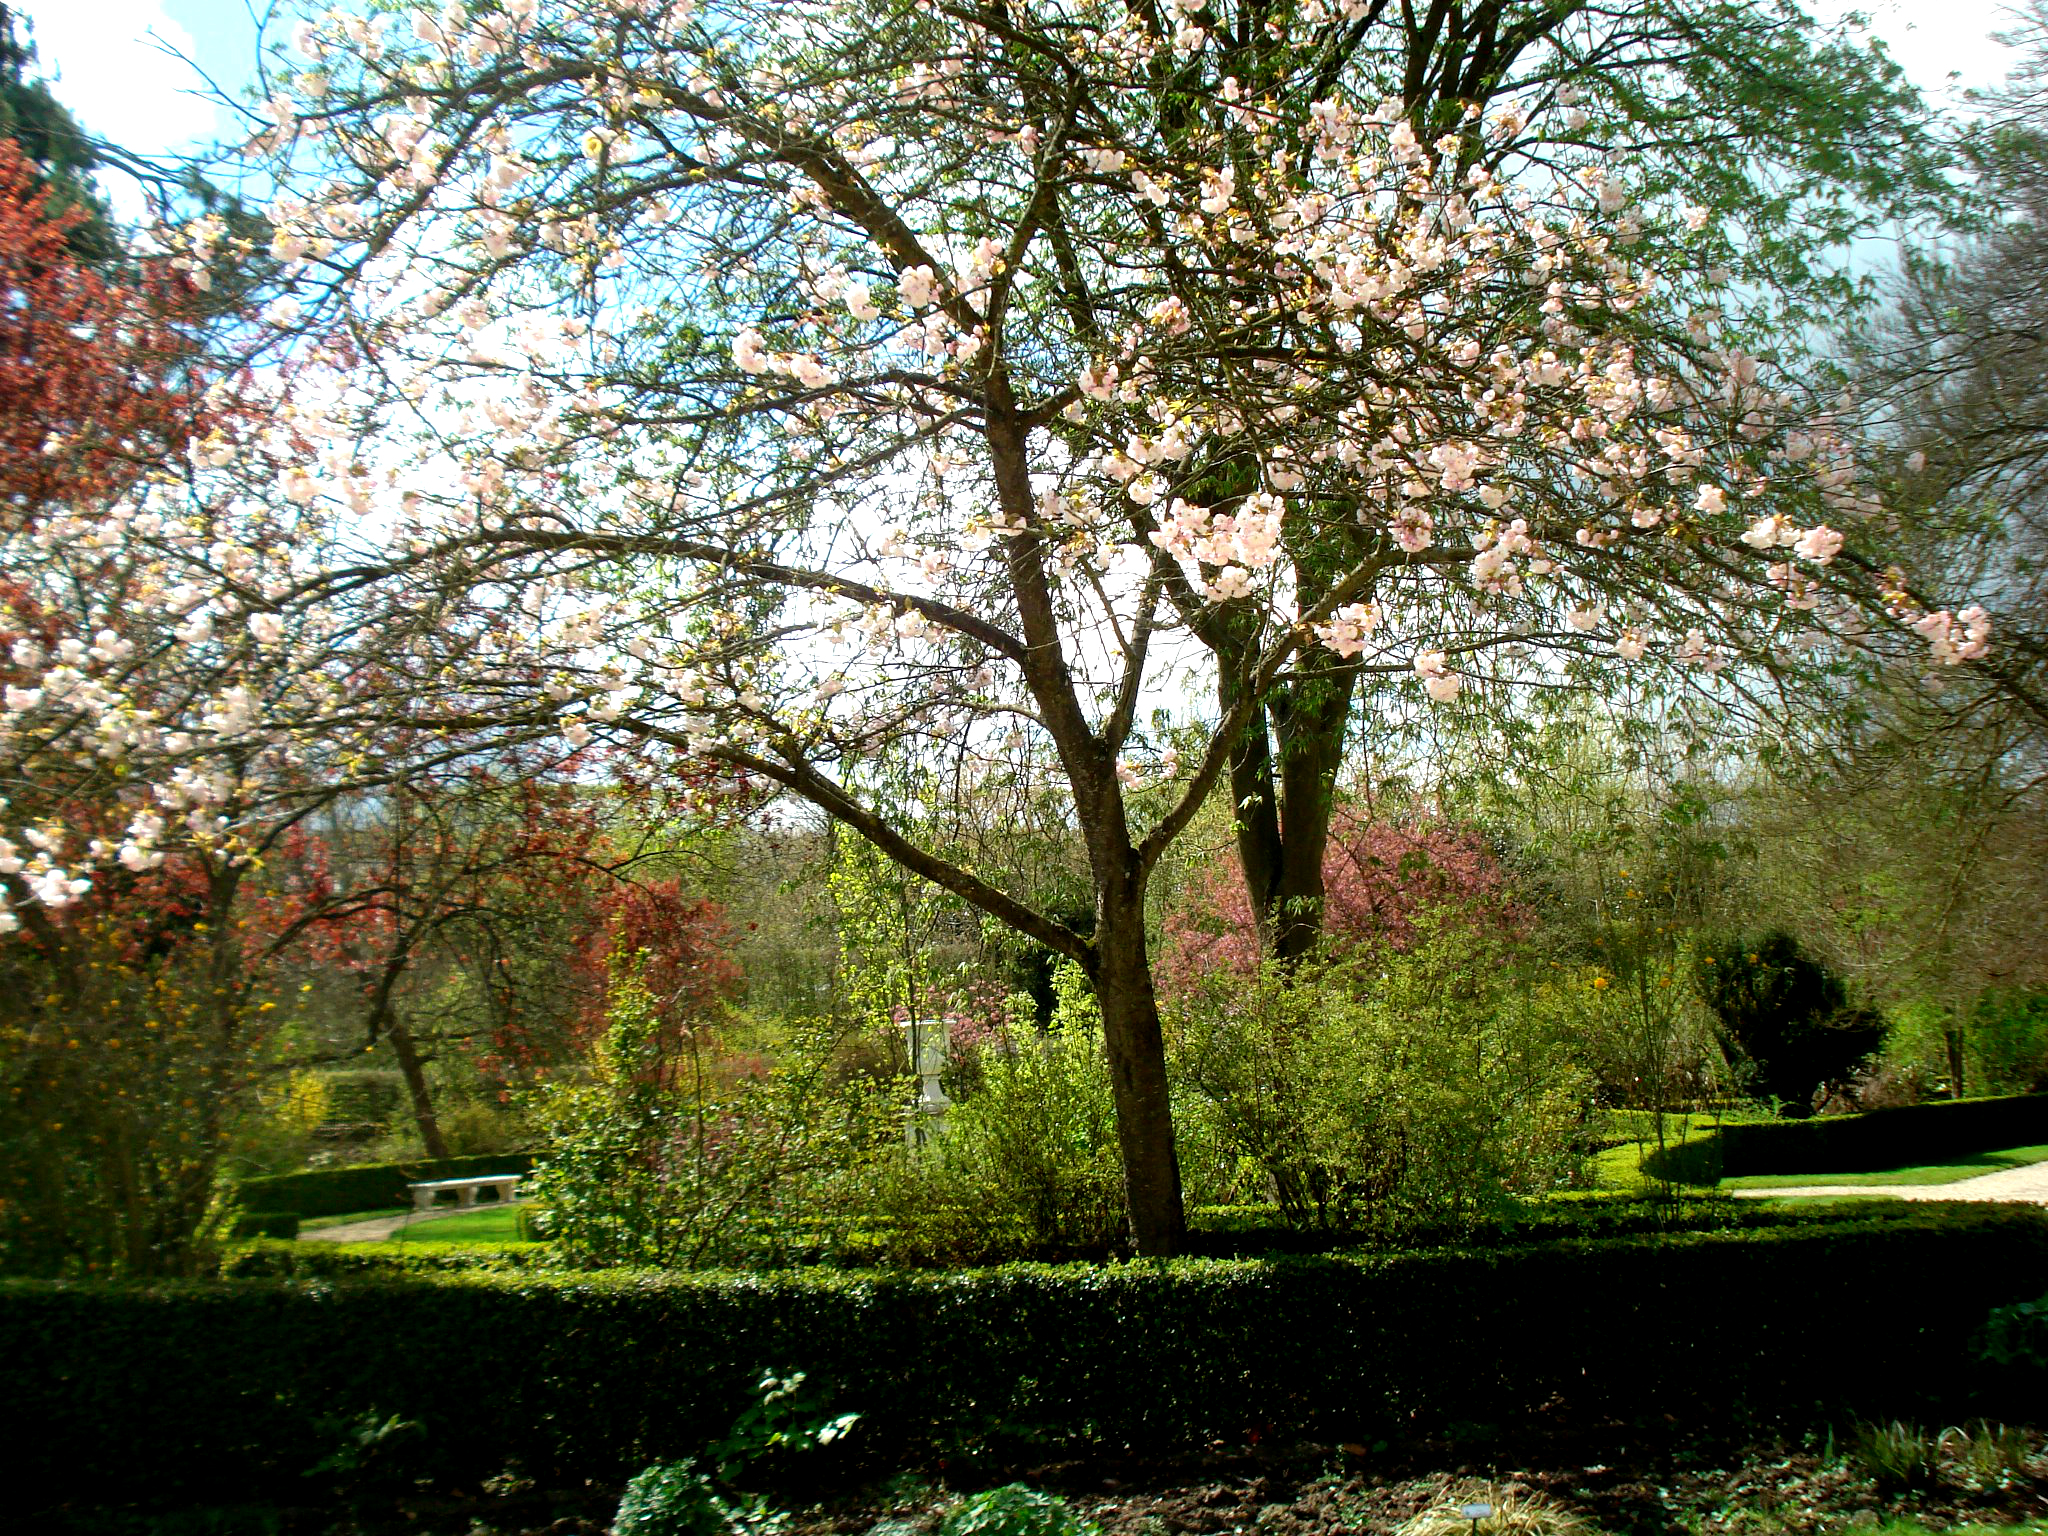 Jardin du roi free stock photos life of pix for Le jardin high wine